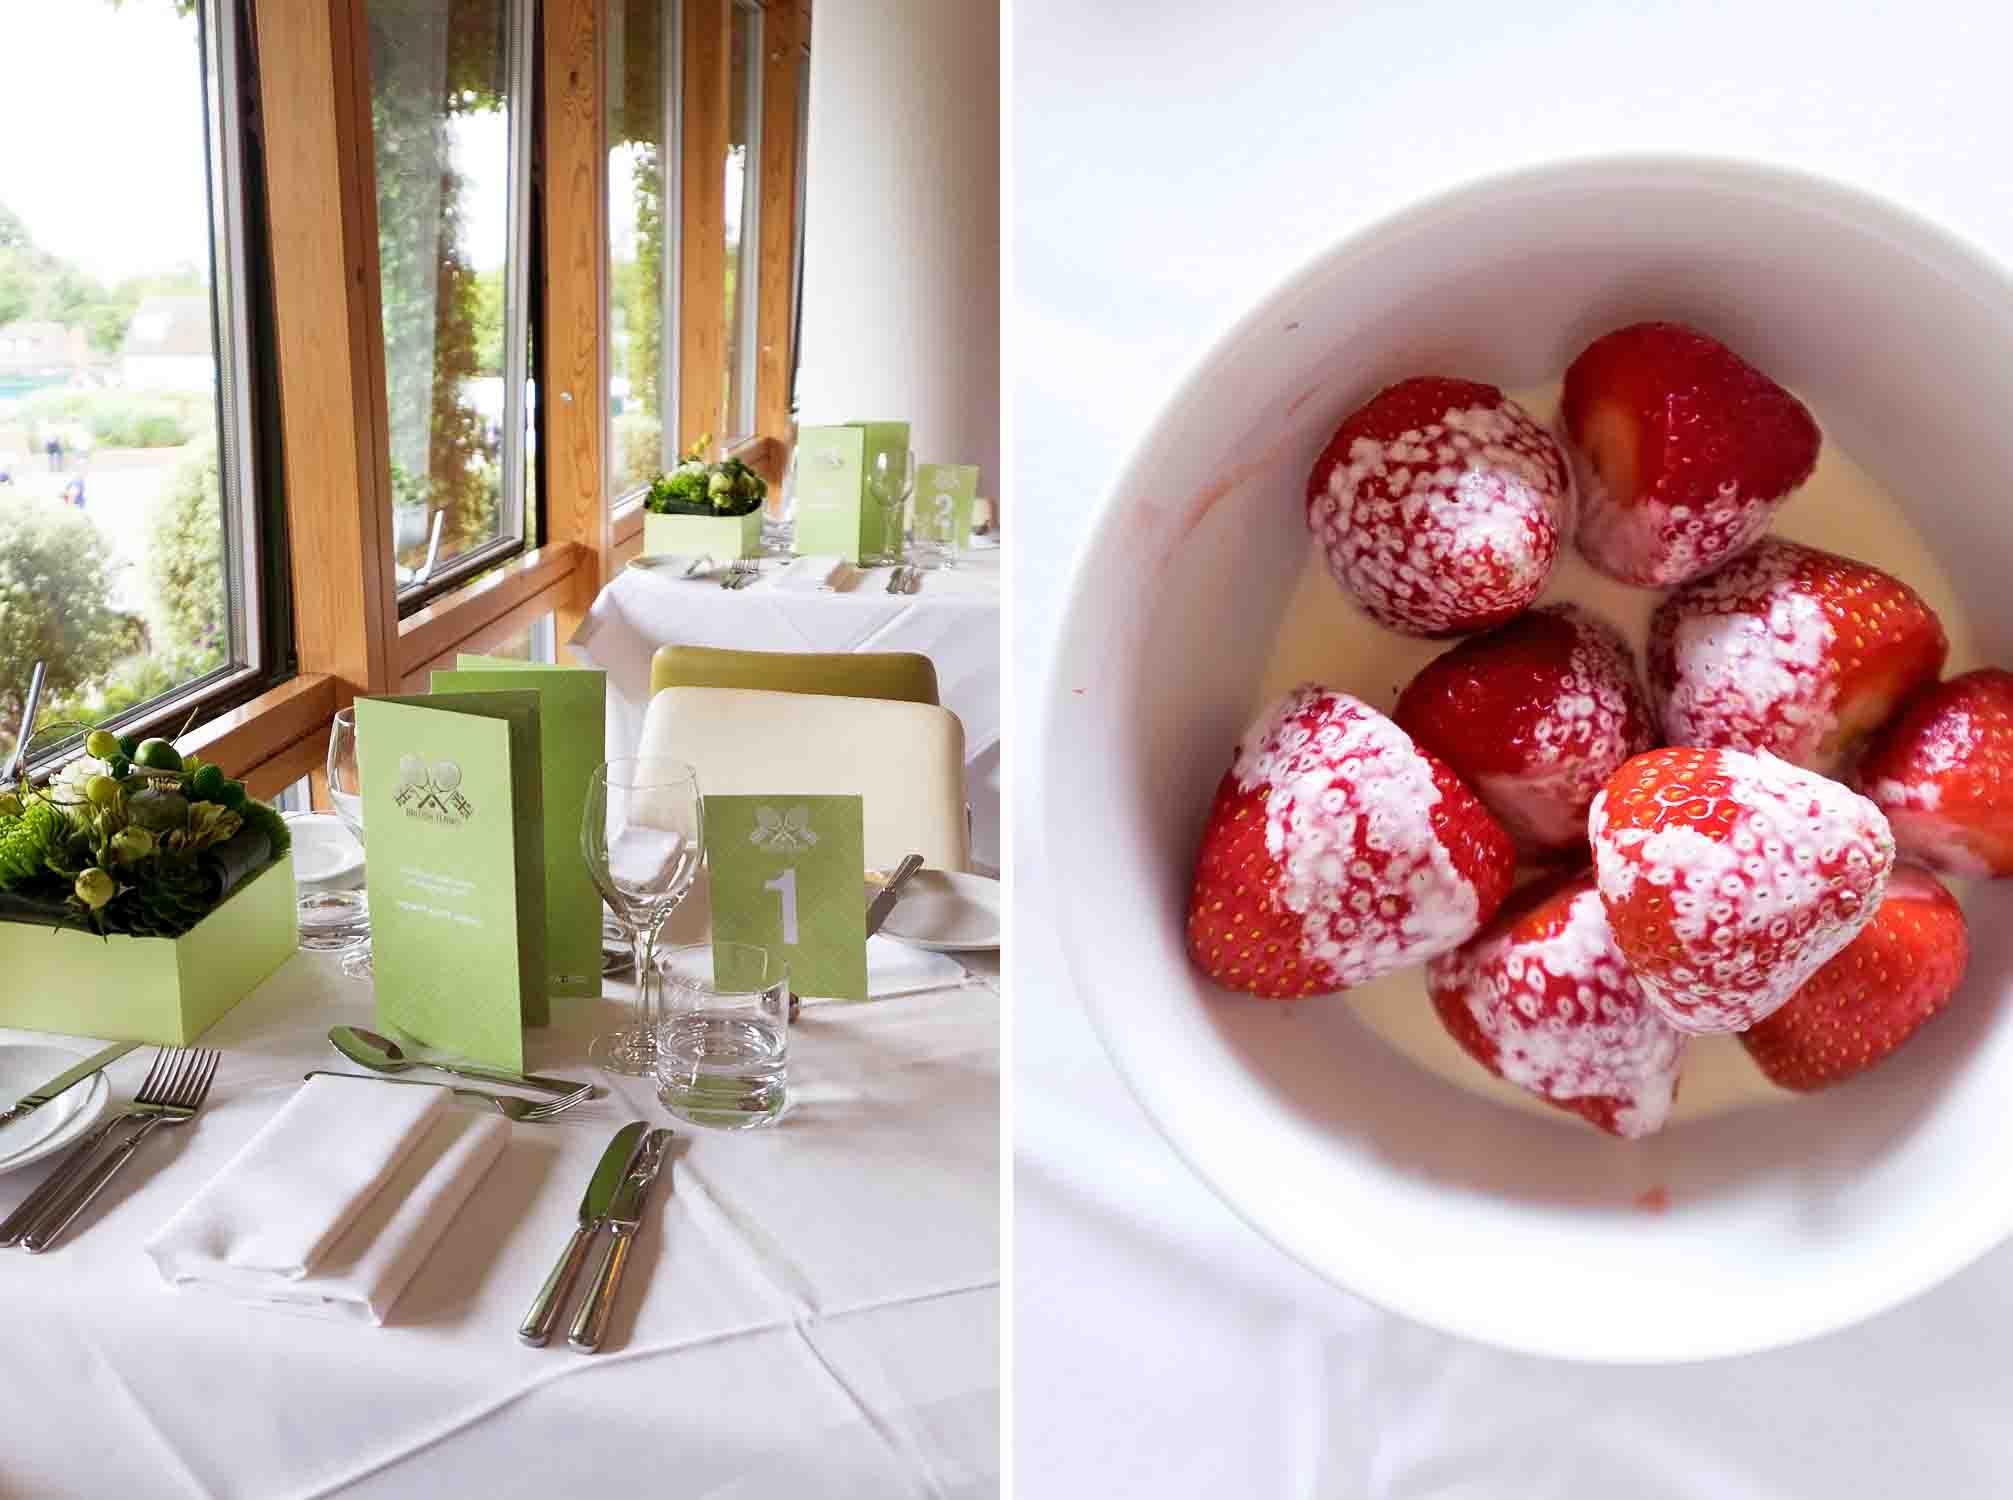 Strawberries and Cream Semifreddo - Mondomulia